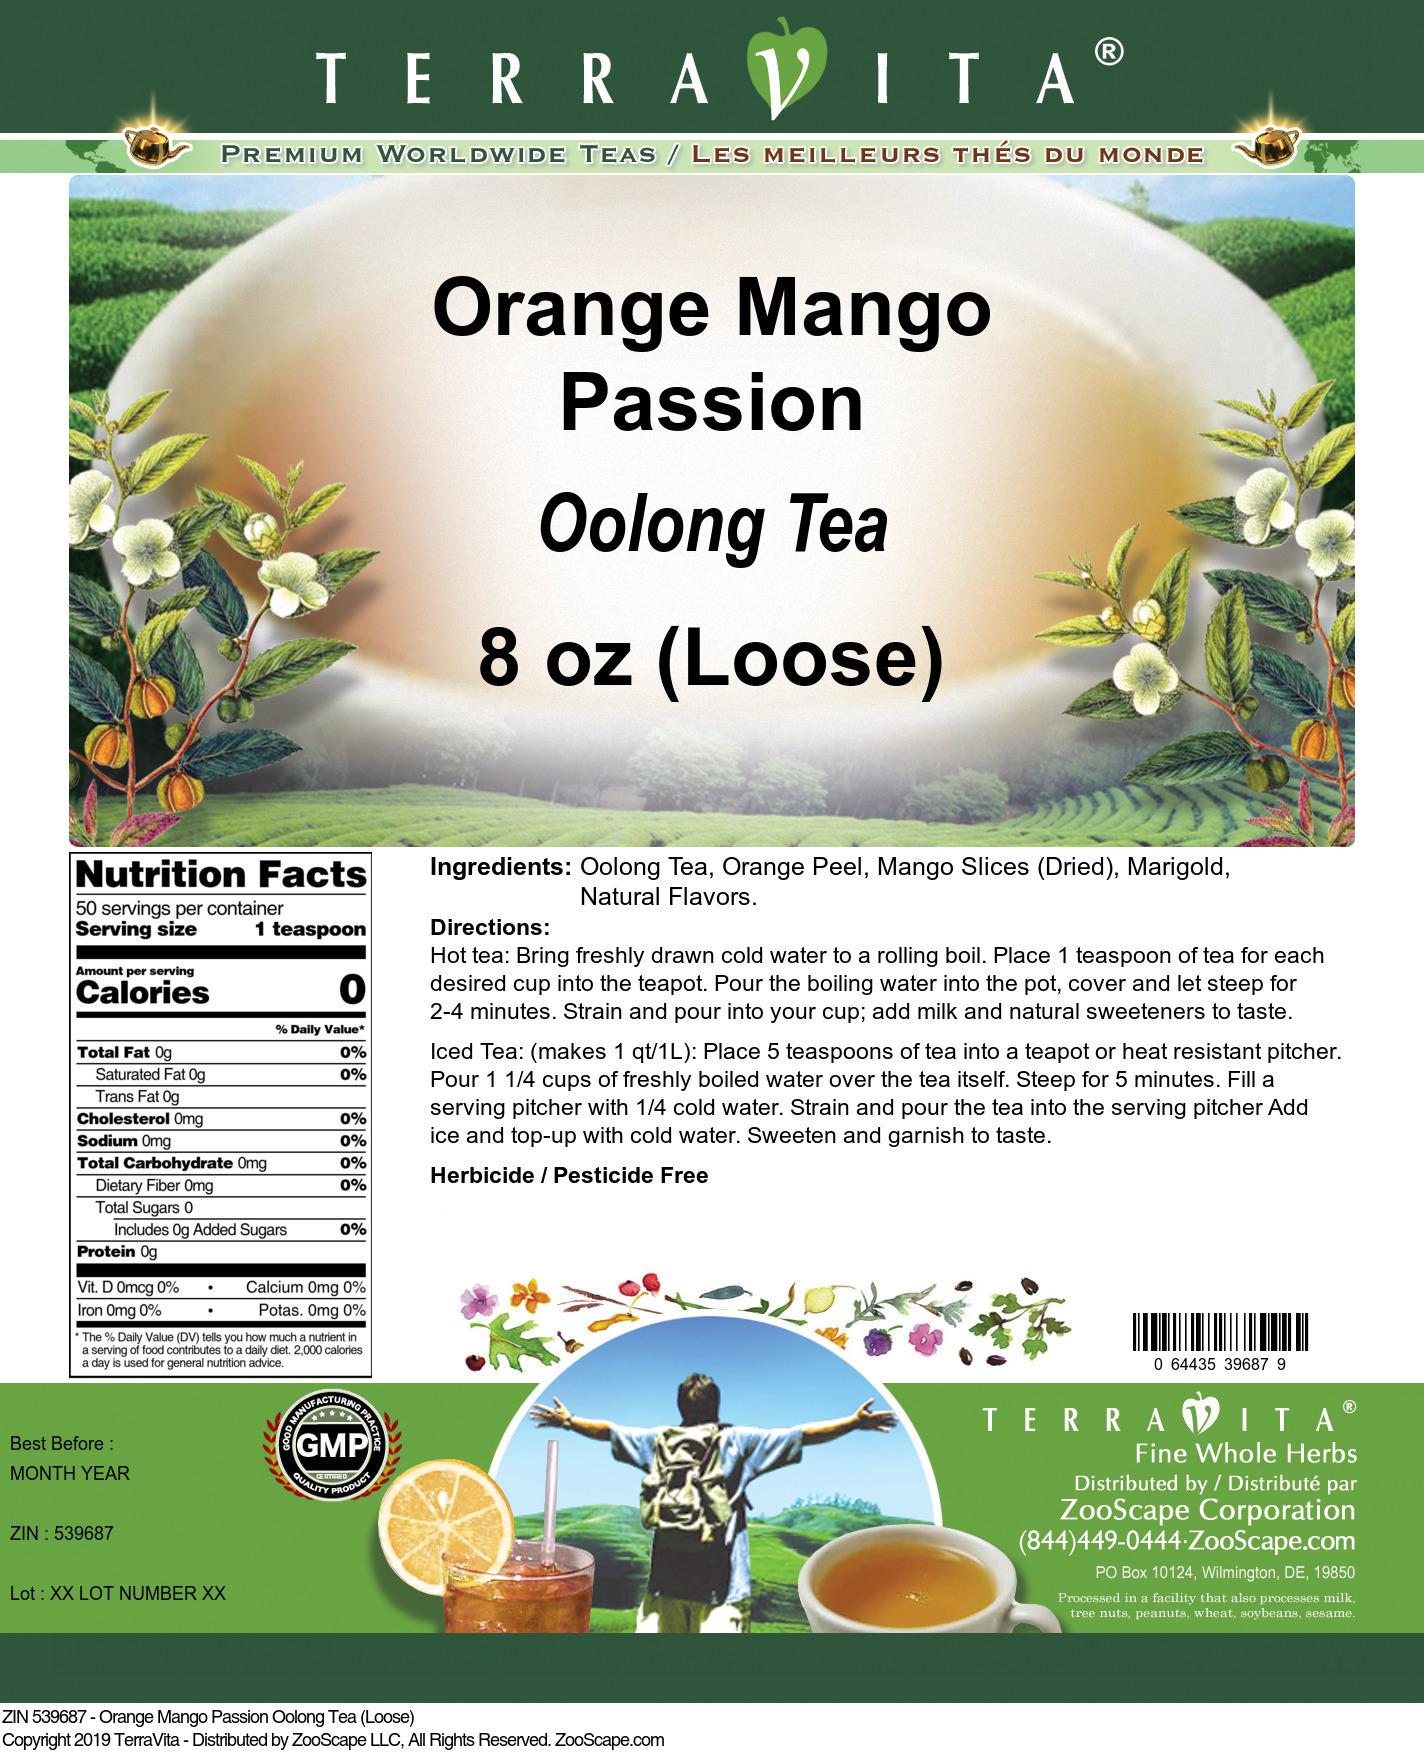 Orange Mango Passion Oolong Tea